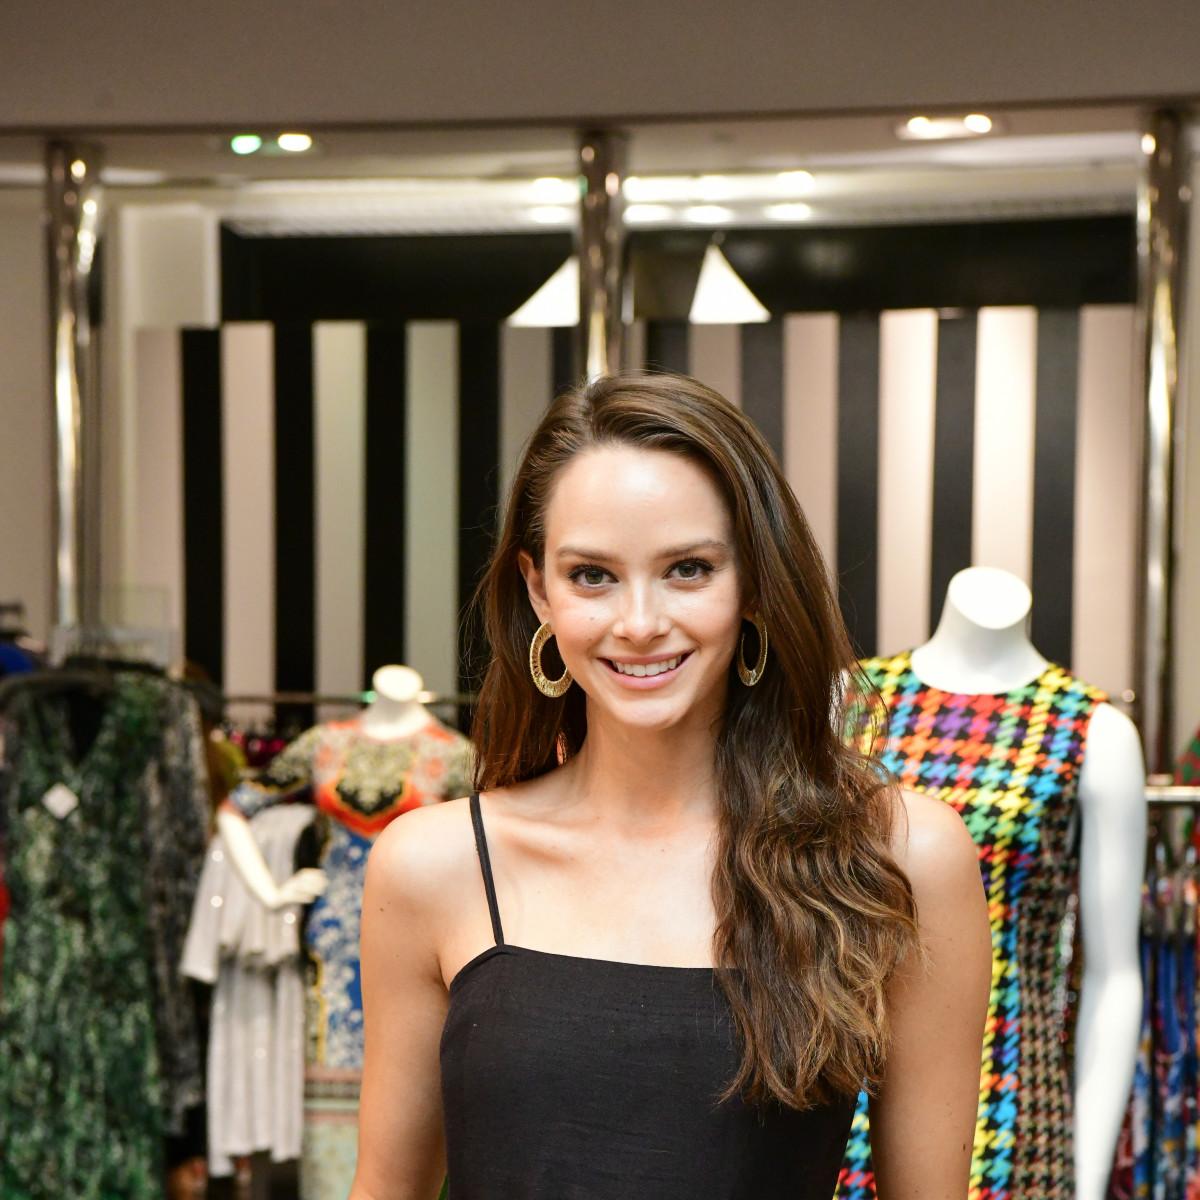 Summer Soiree Dress for Success WOW Tootsies Alyssa Case, owner of Graze